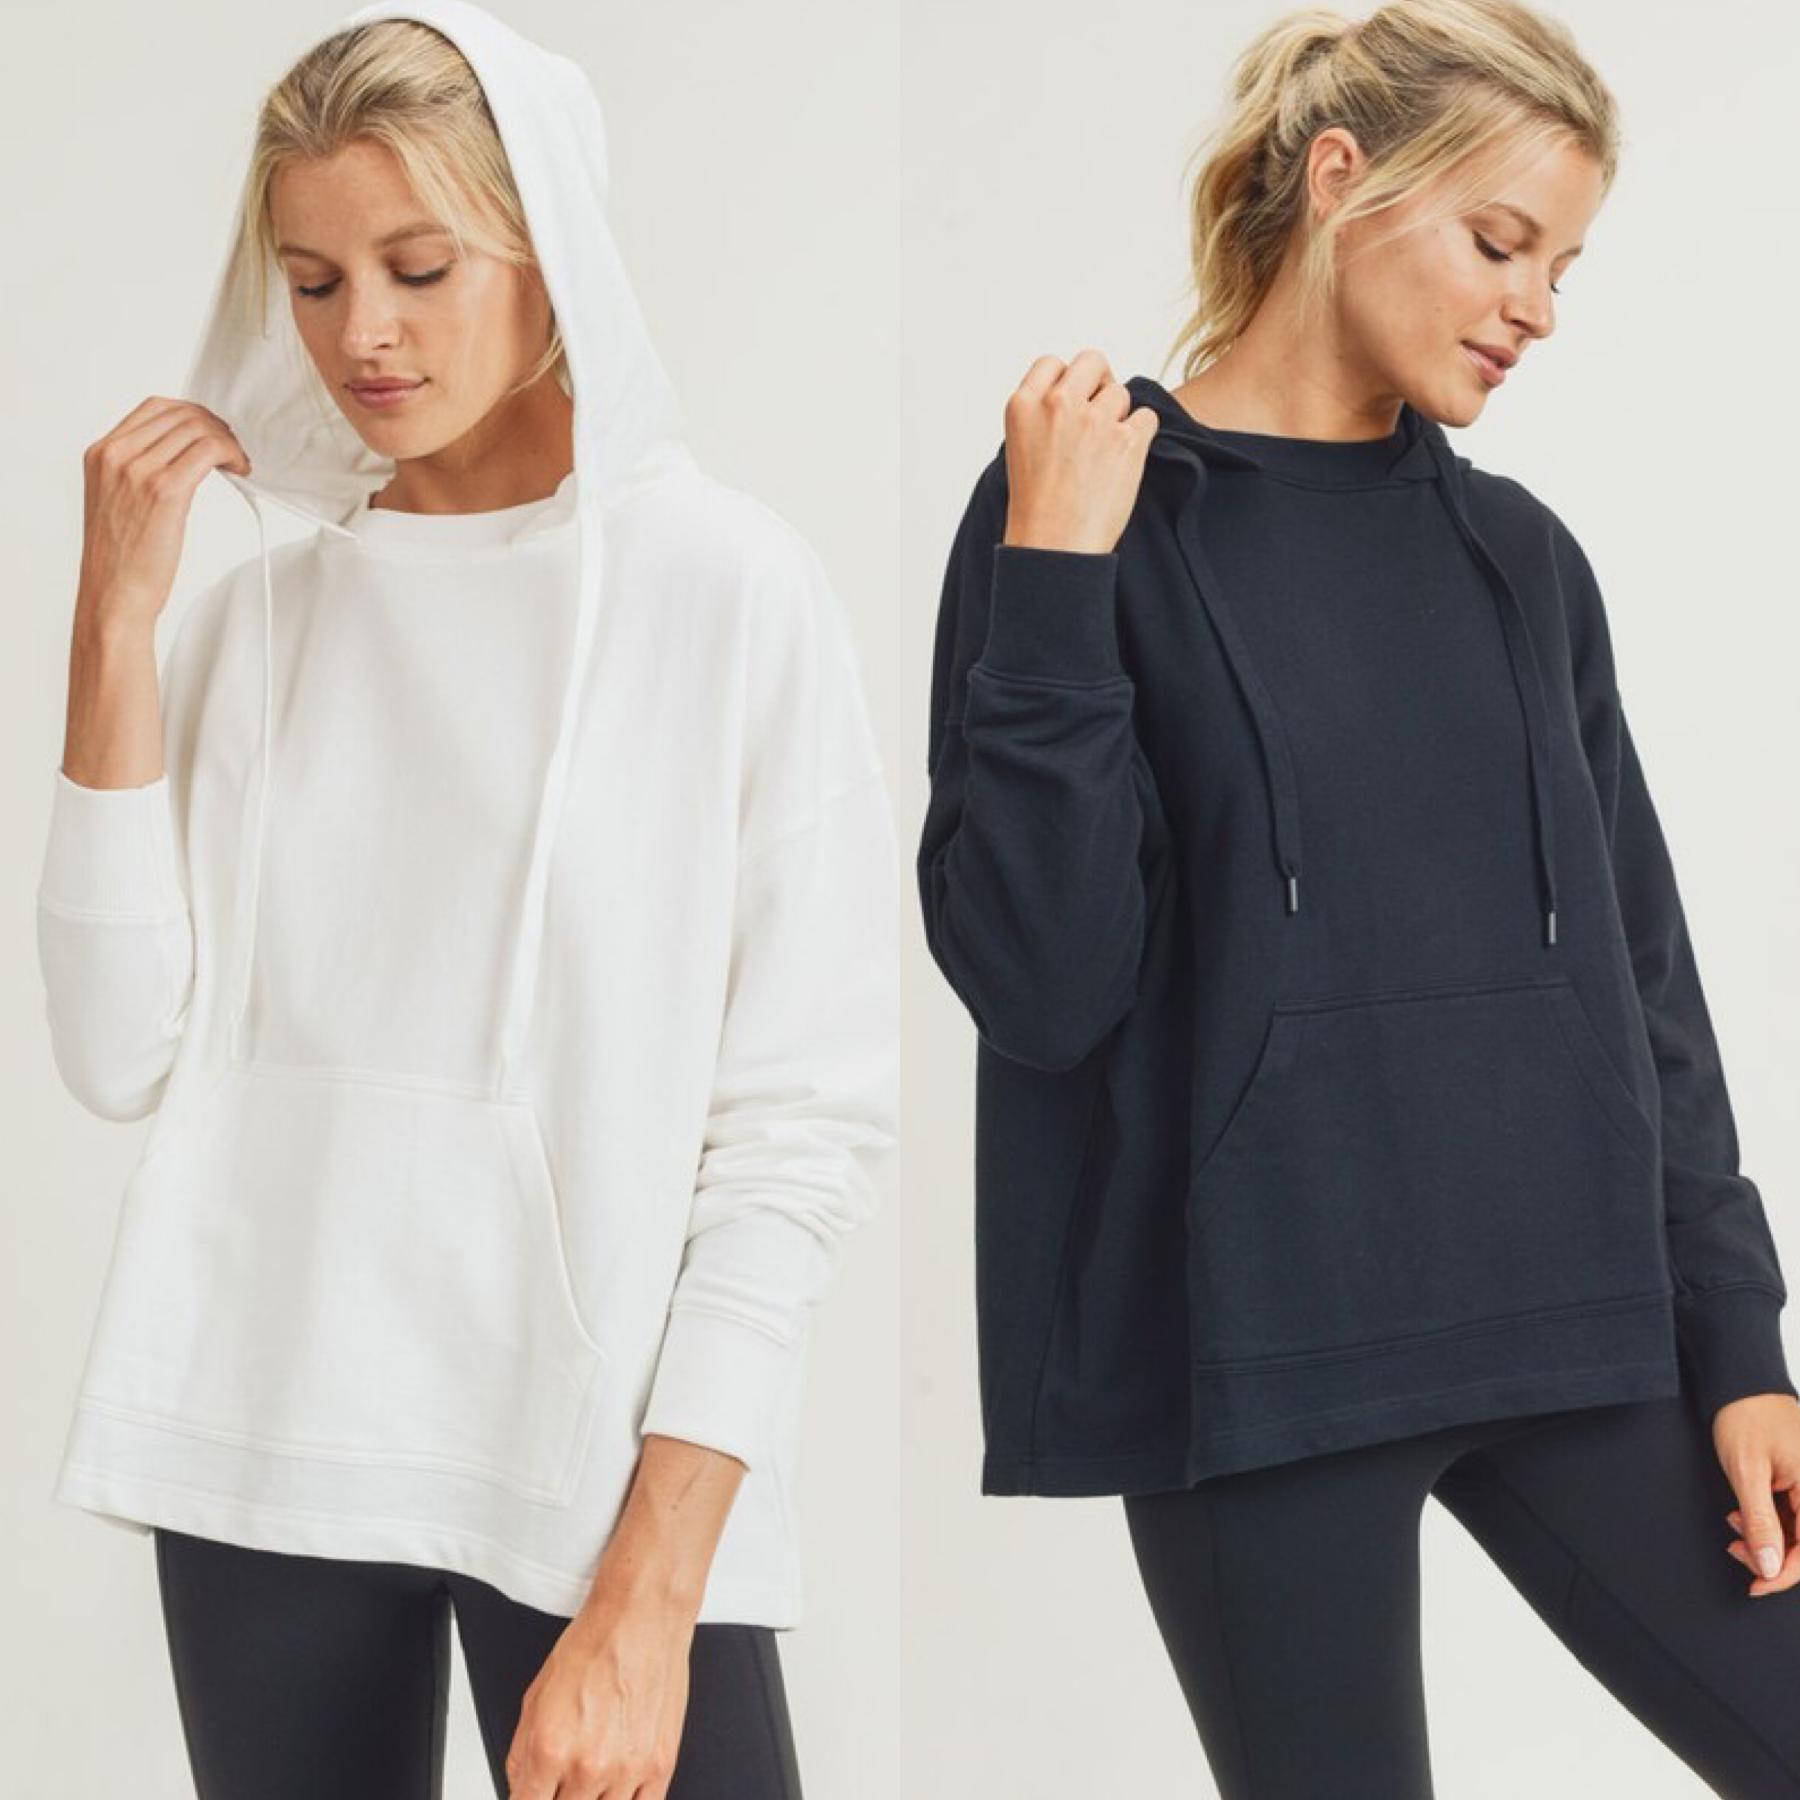 Boxy Pullover Sweatshirt